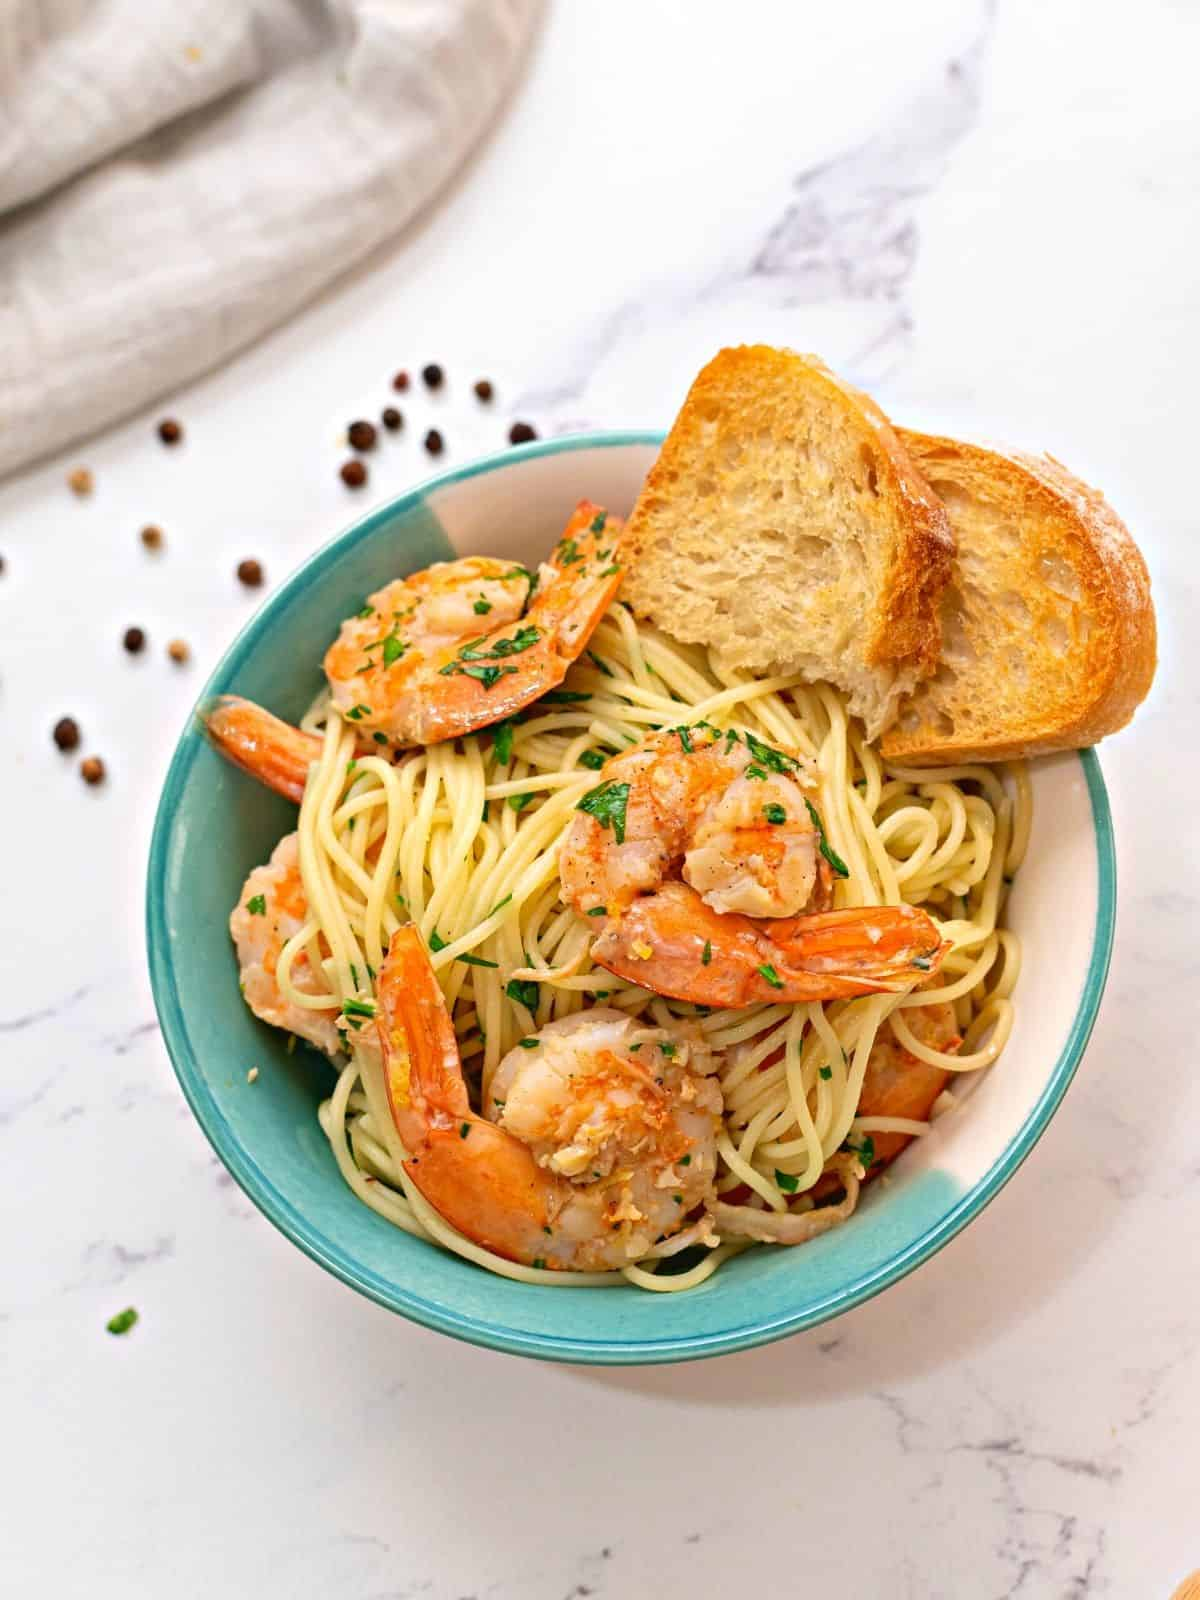 Bowl of Shrimp Scampi Pasta with garlic toast.